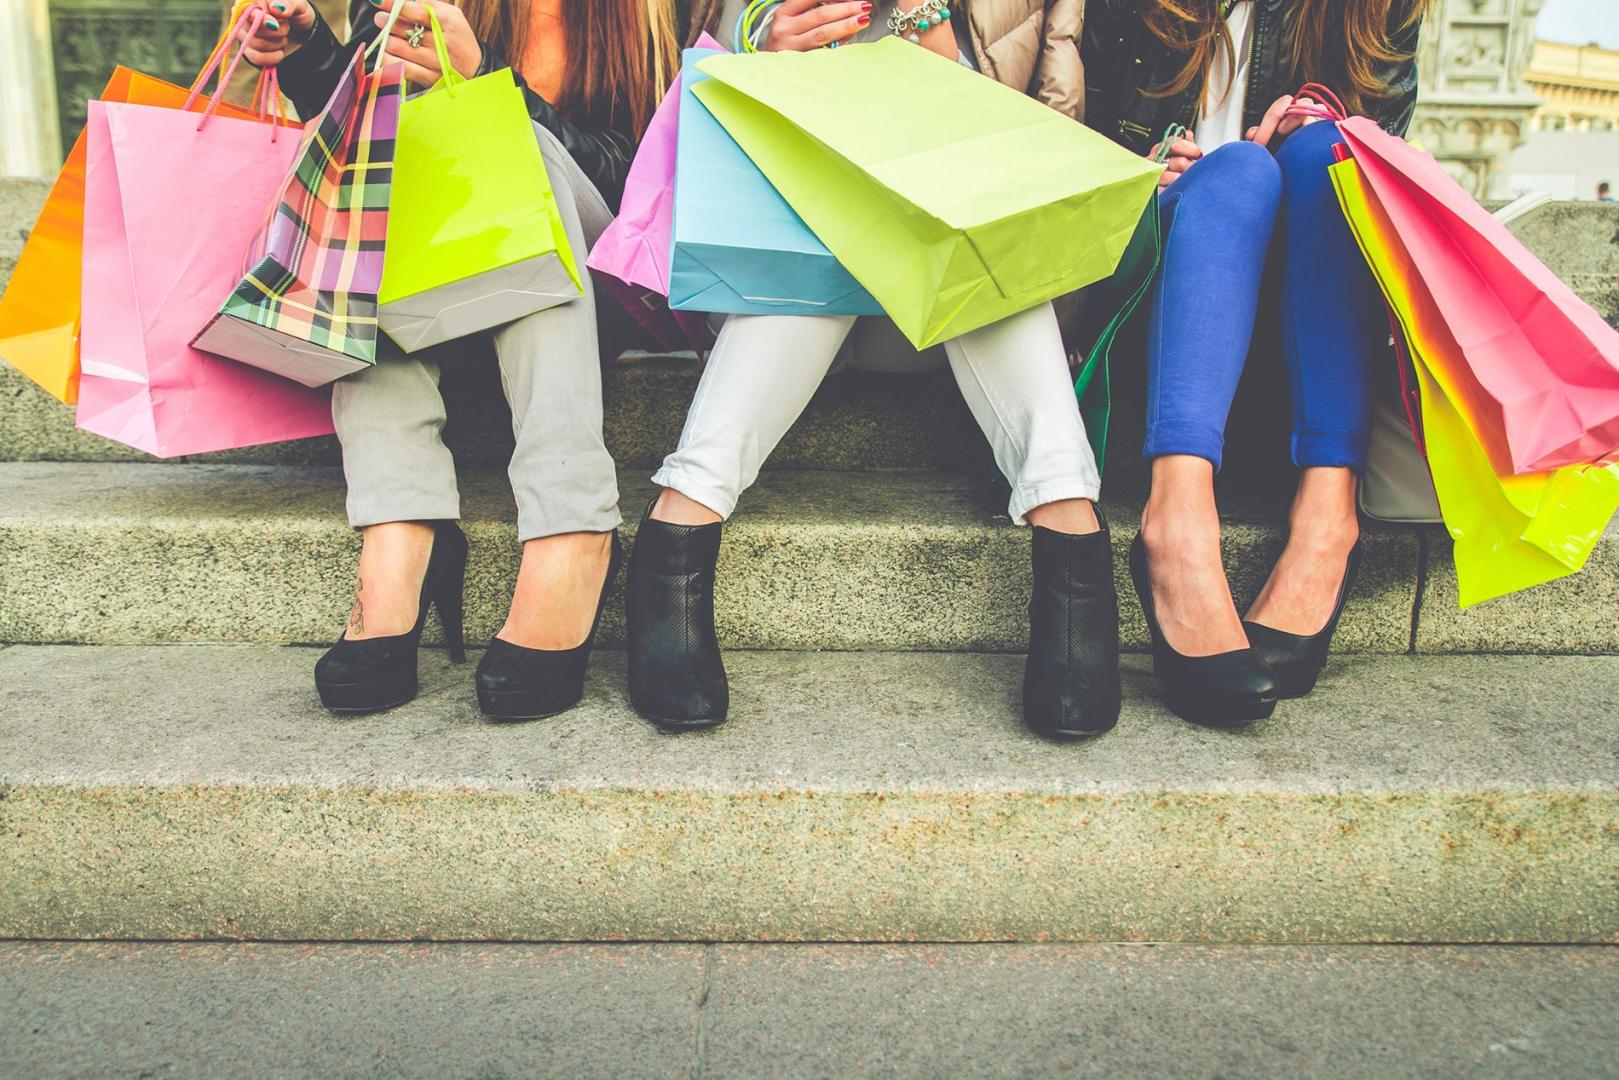 Females shopping